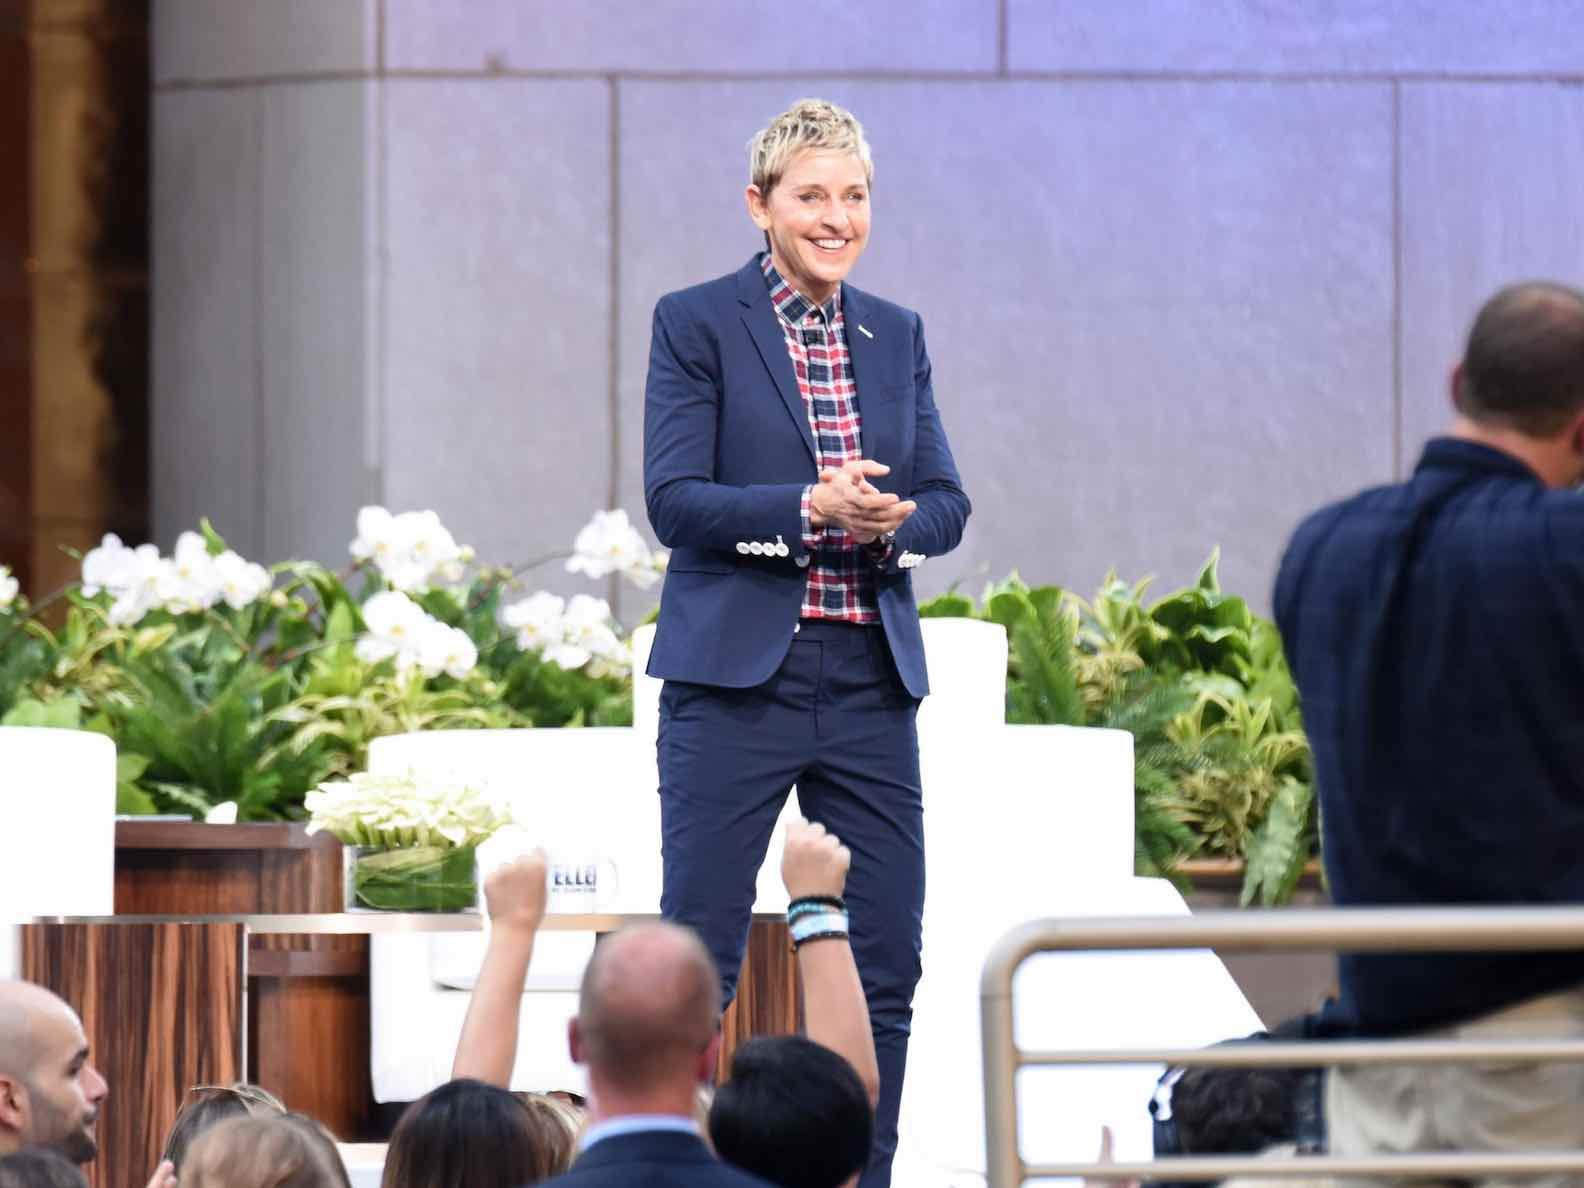 Ellen DeGeneres announces special perks for employees amid toxicity complaints